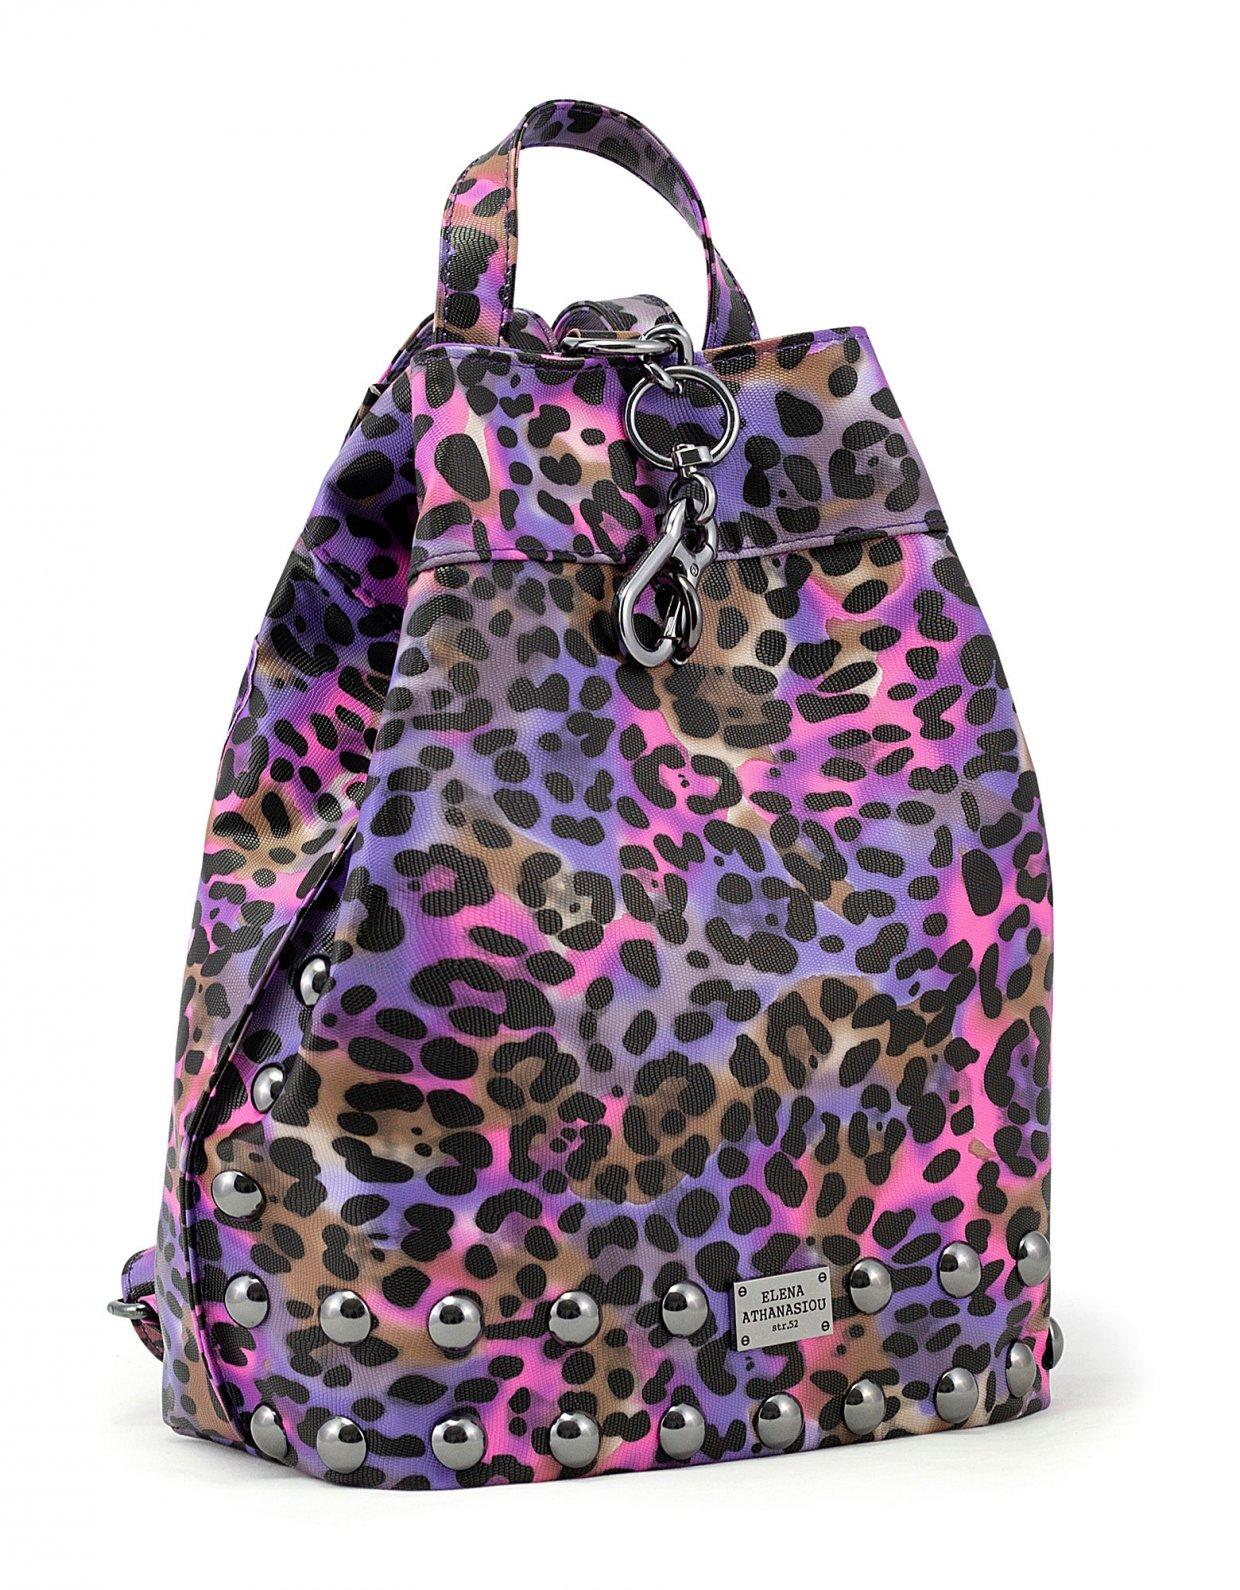 Elena Athanasiou Backpack animal print purple nickel